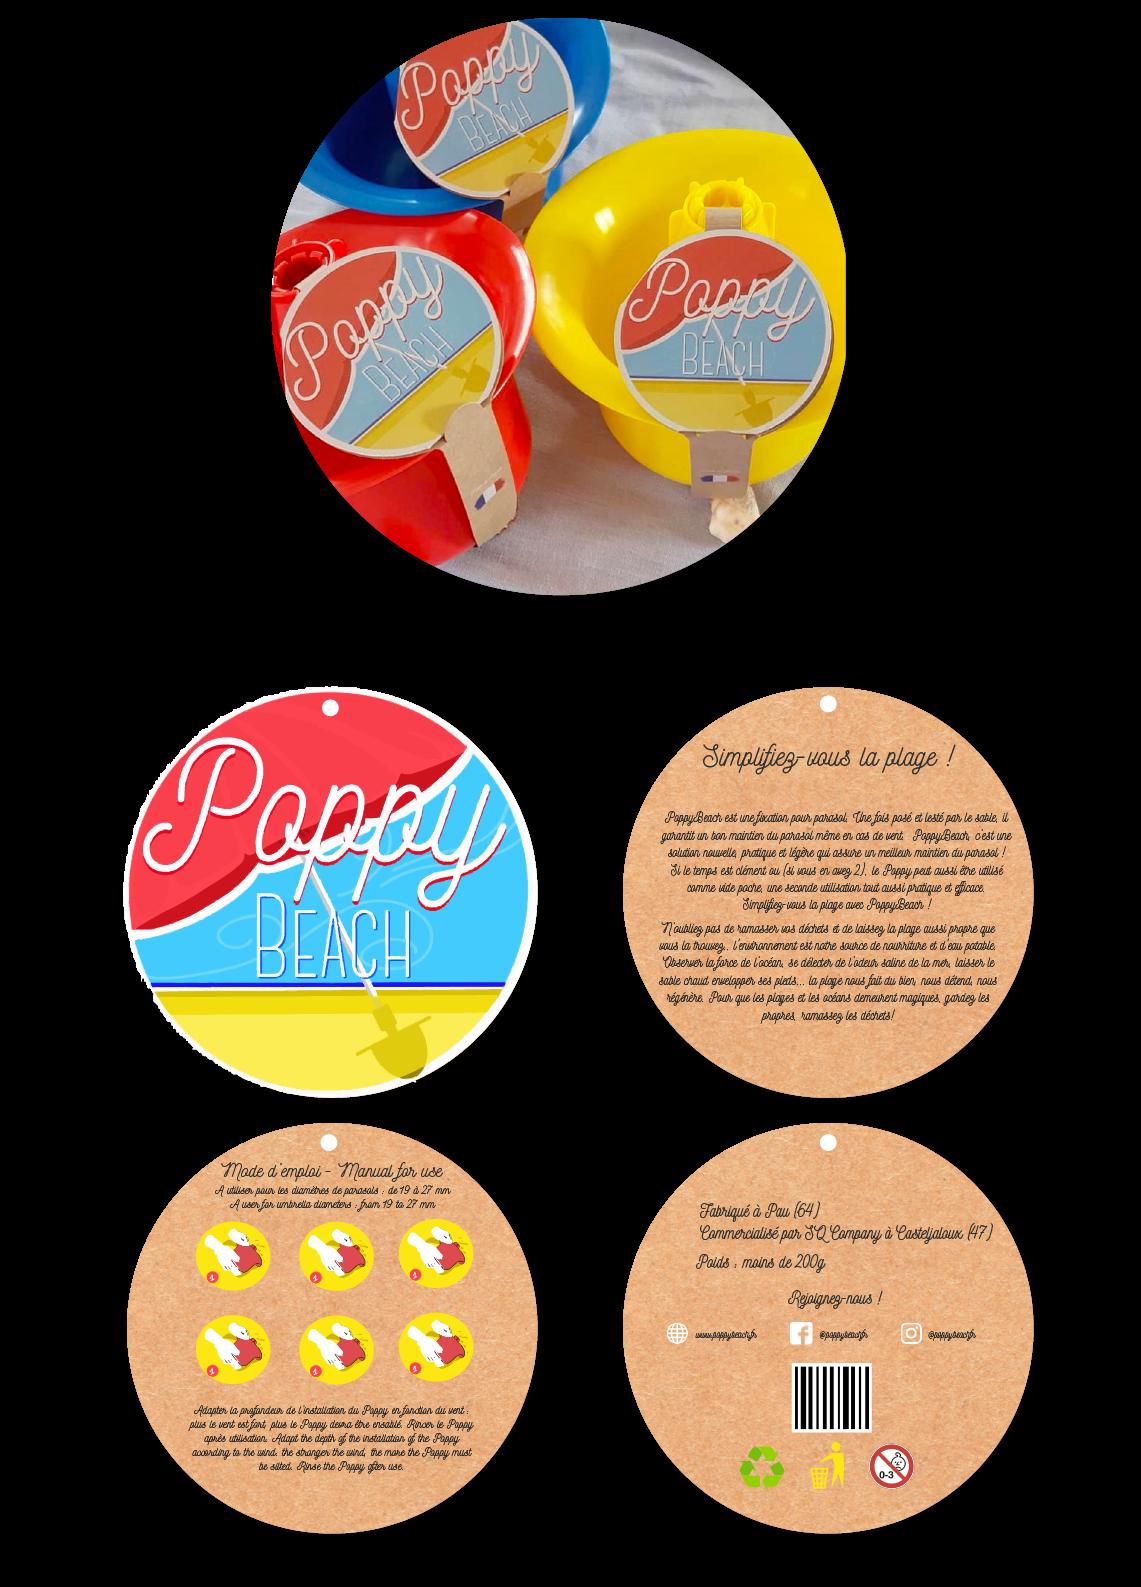 Packaging PoppyBeach